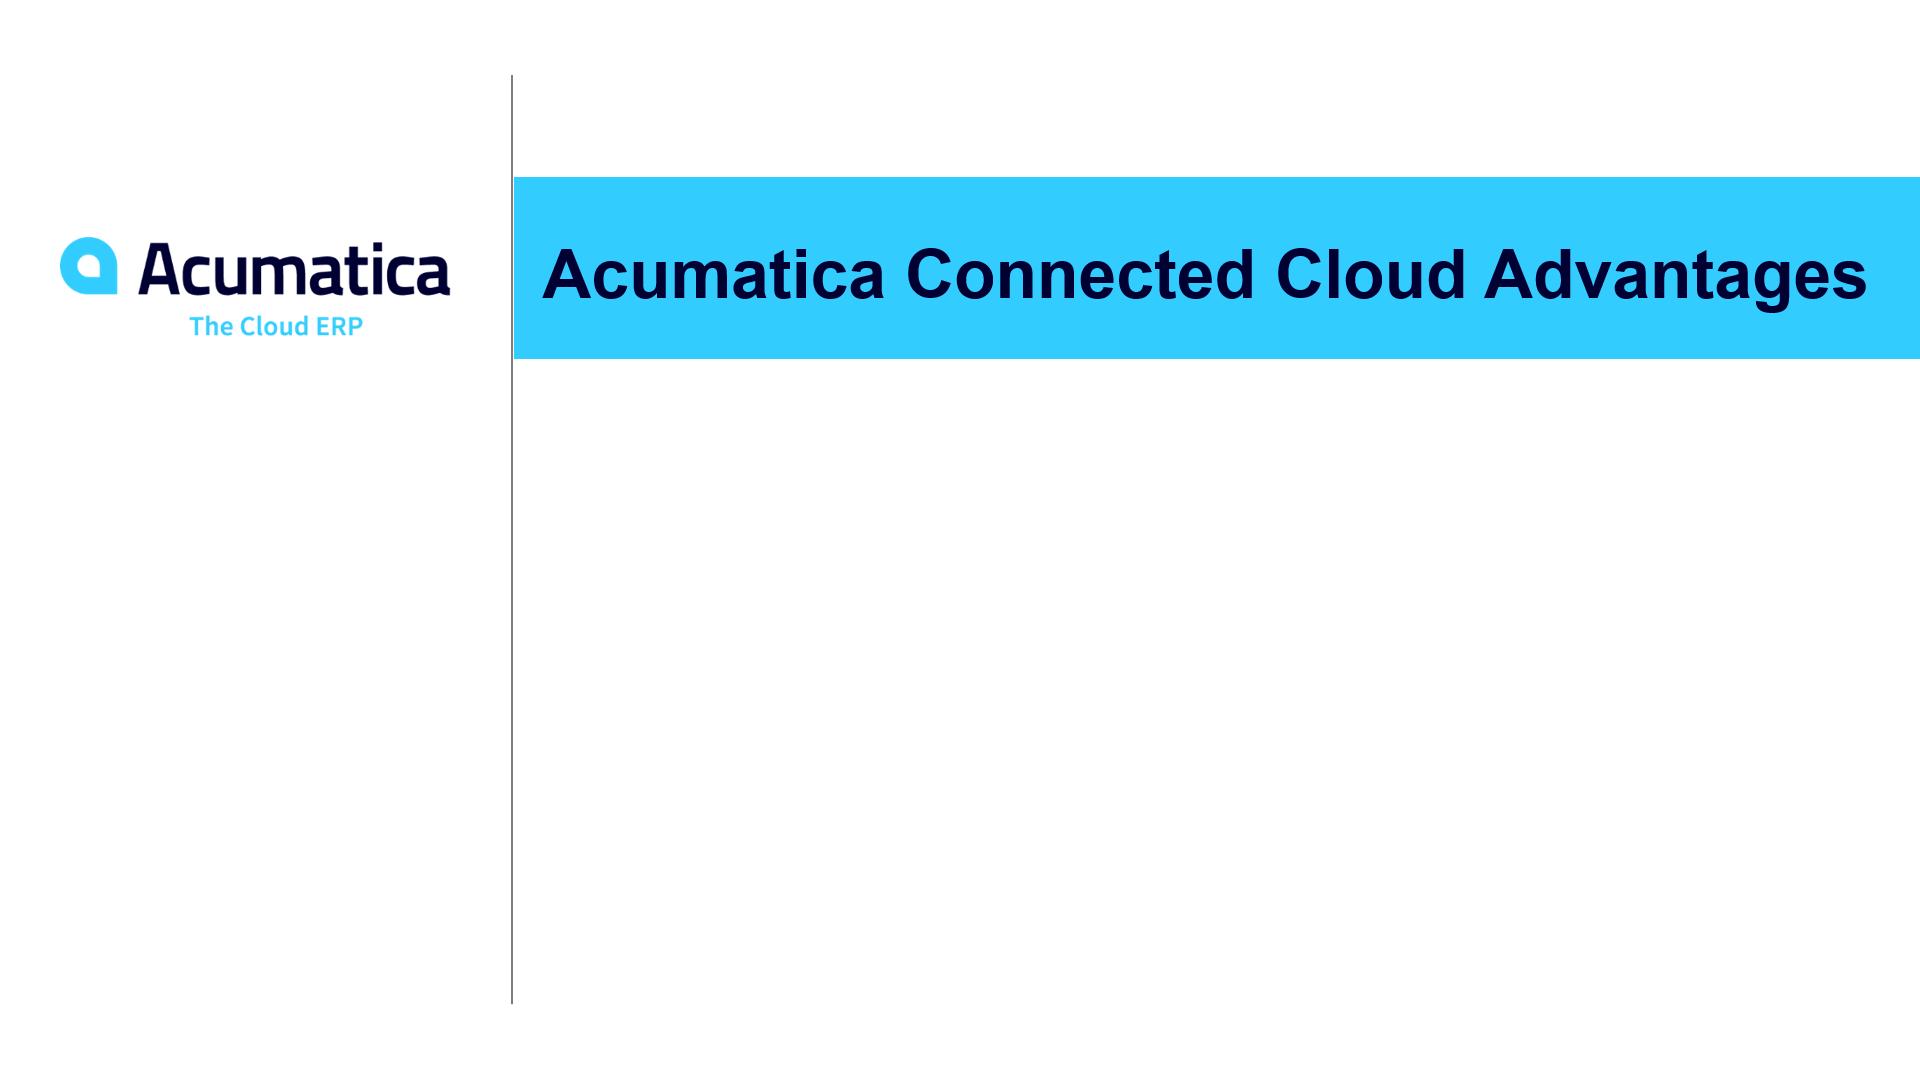 Acumatica Connected Cloud Advantages